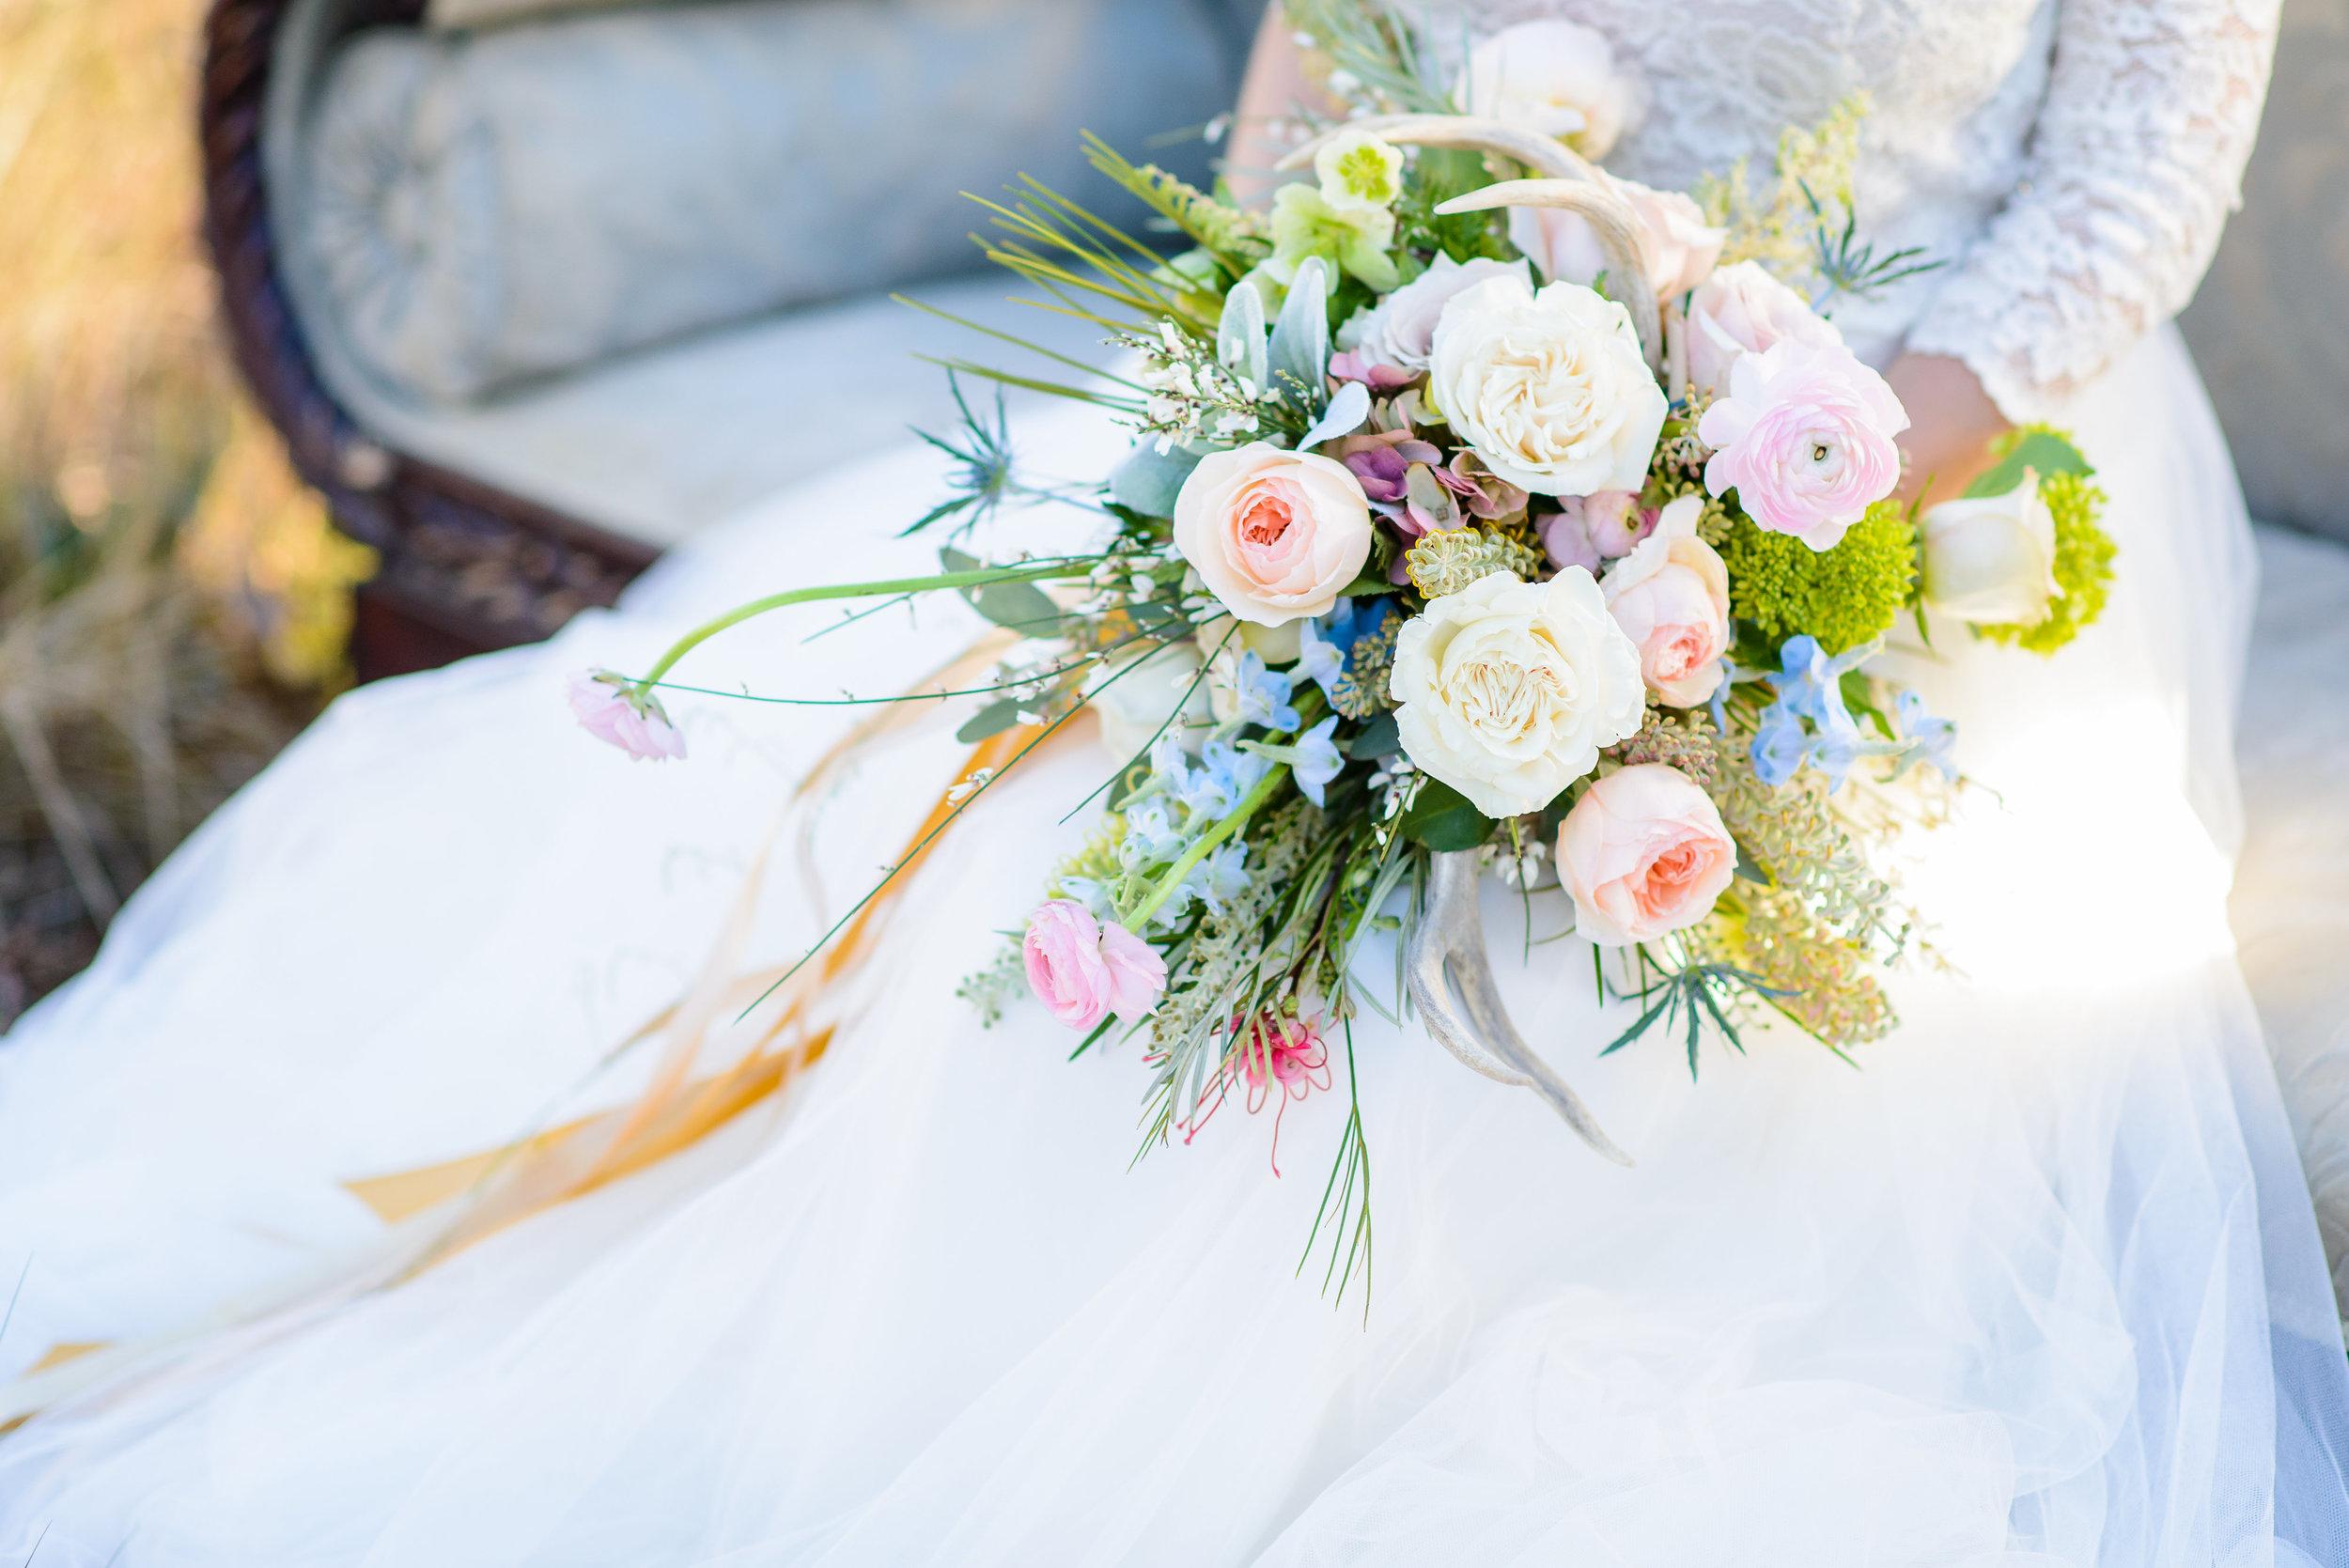 Blue, Pink, Peach Bouquet - Boho Antler Styled Shoot - The Veil Wedding Photography, Lori Parker Floral Studio